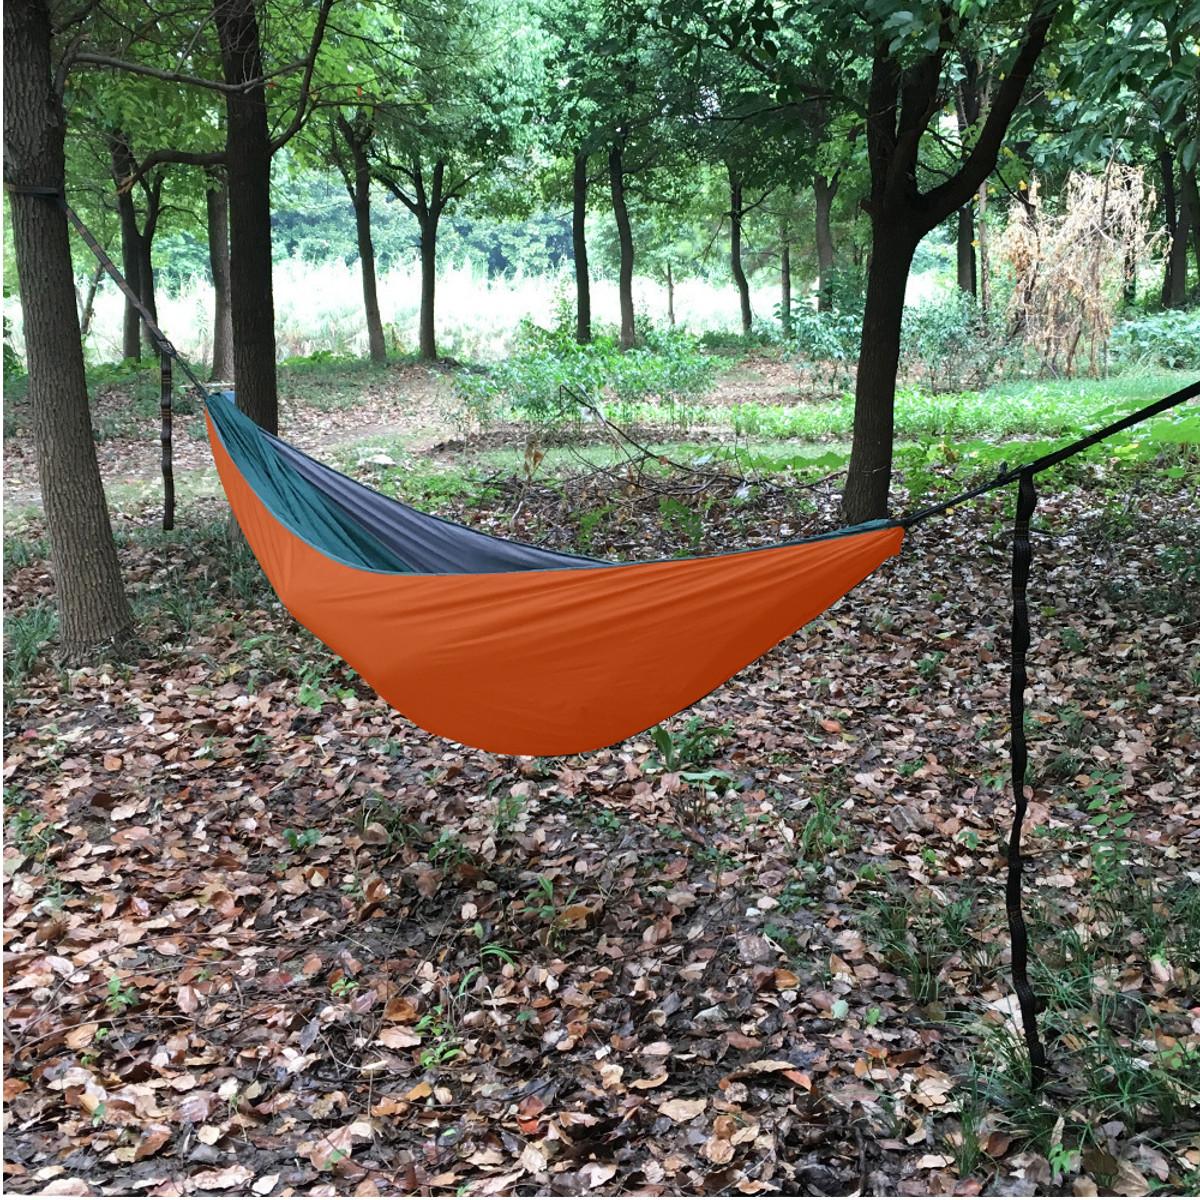 Camping Hammock Underquilt Outdoor Winter Down Warm Sleeping Bag